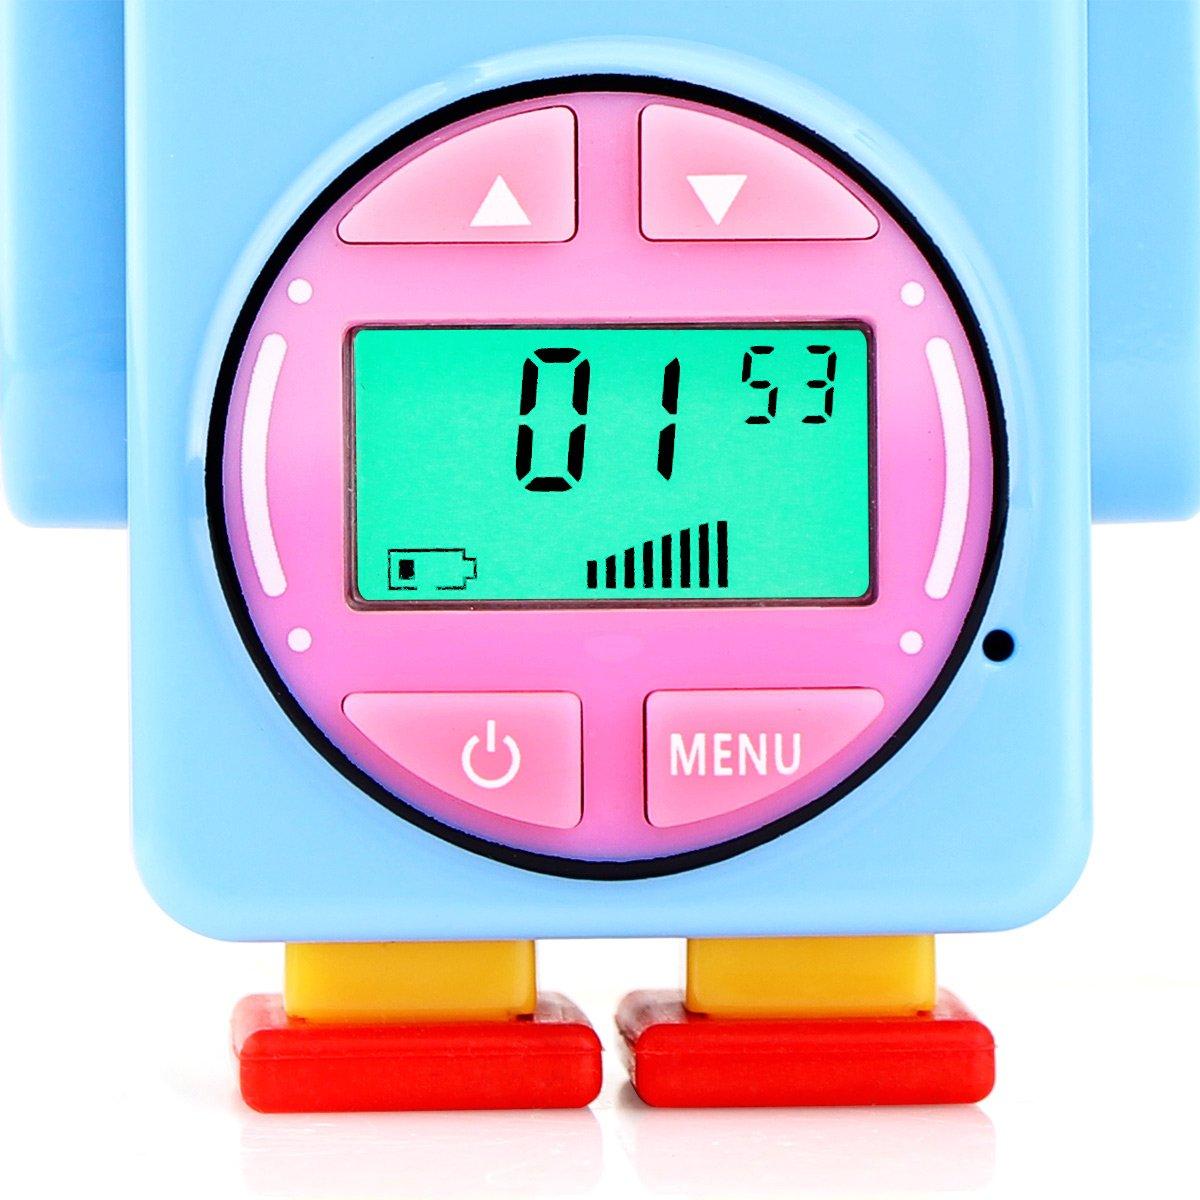 Retevis RT36 Kids Walkie Talkies Rechargeable Battery USB Charging Flashlight Long Range Crystal Sound License Free Walkie Talkies for Kids (Blue,2 Pack) by Retevis (Image #10)